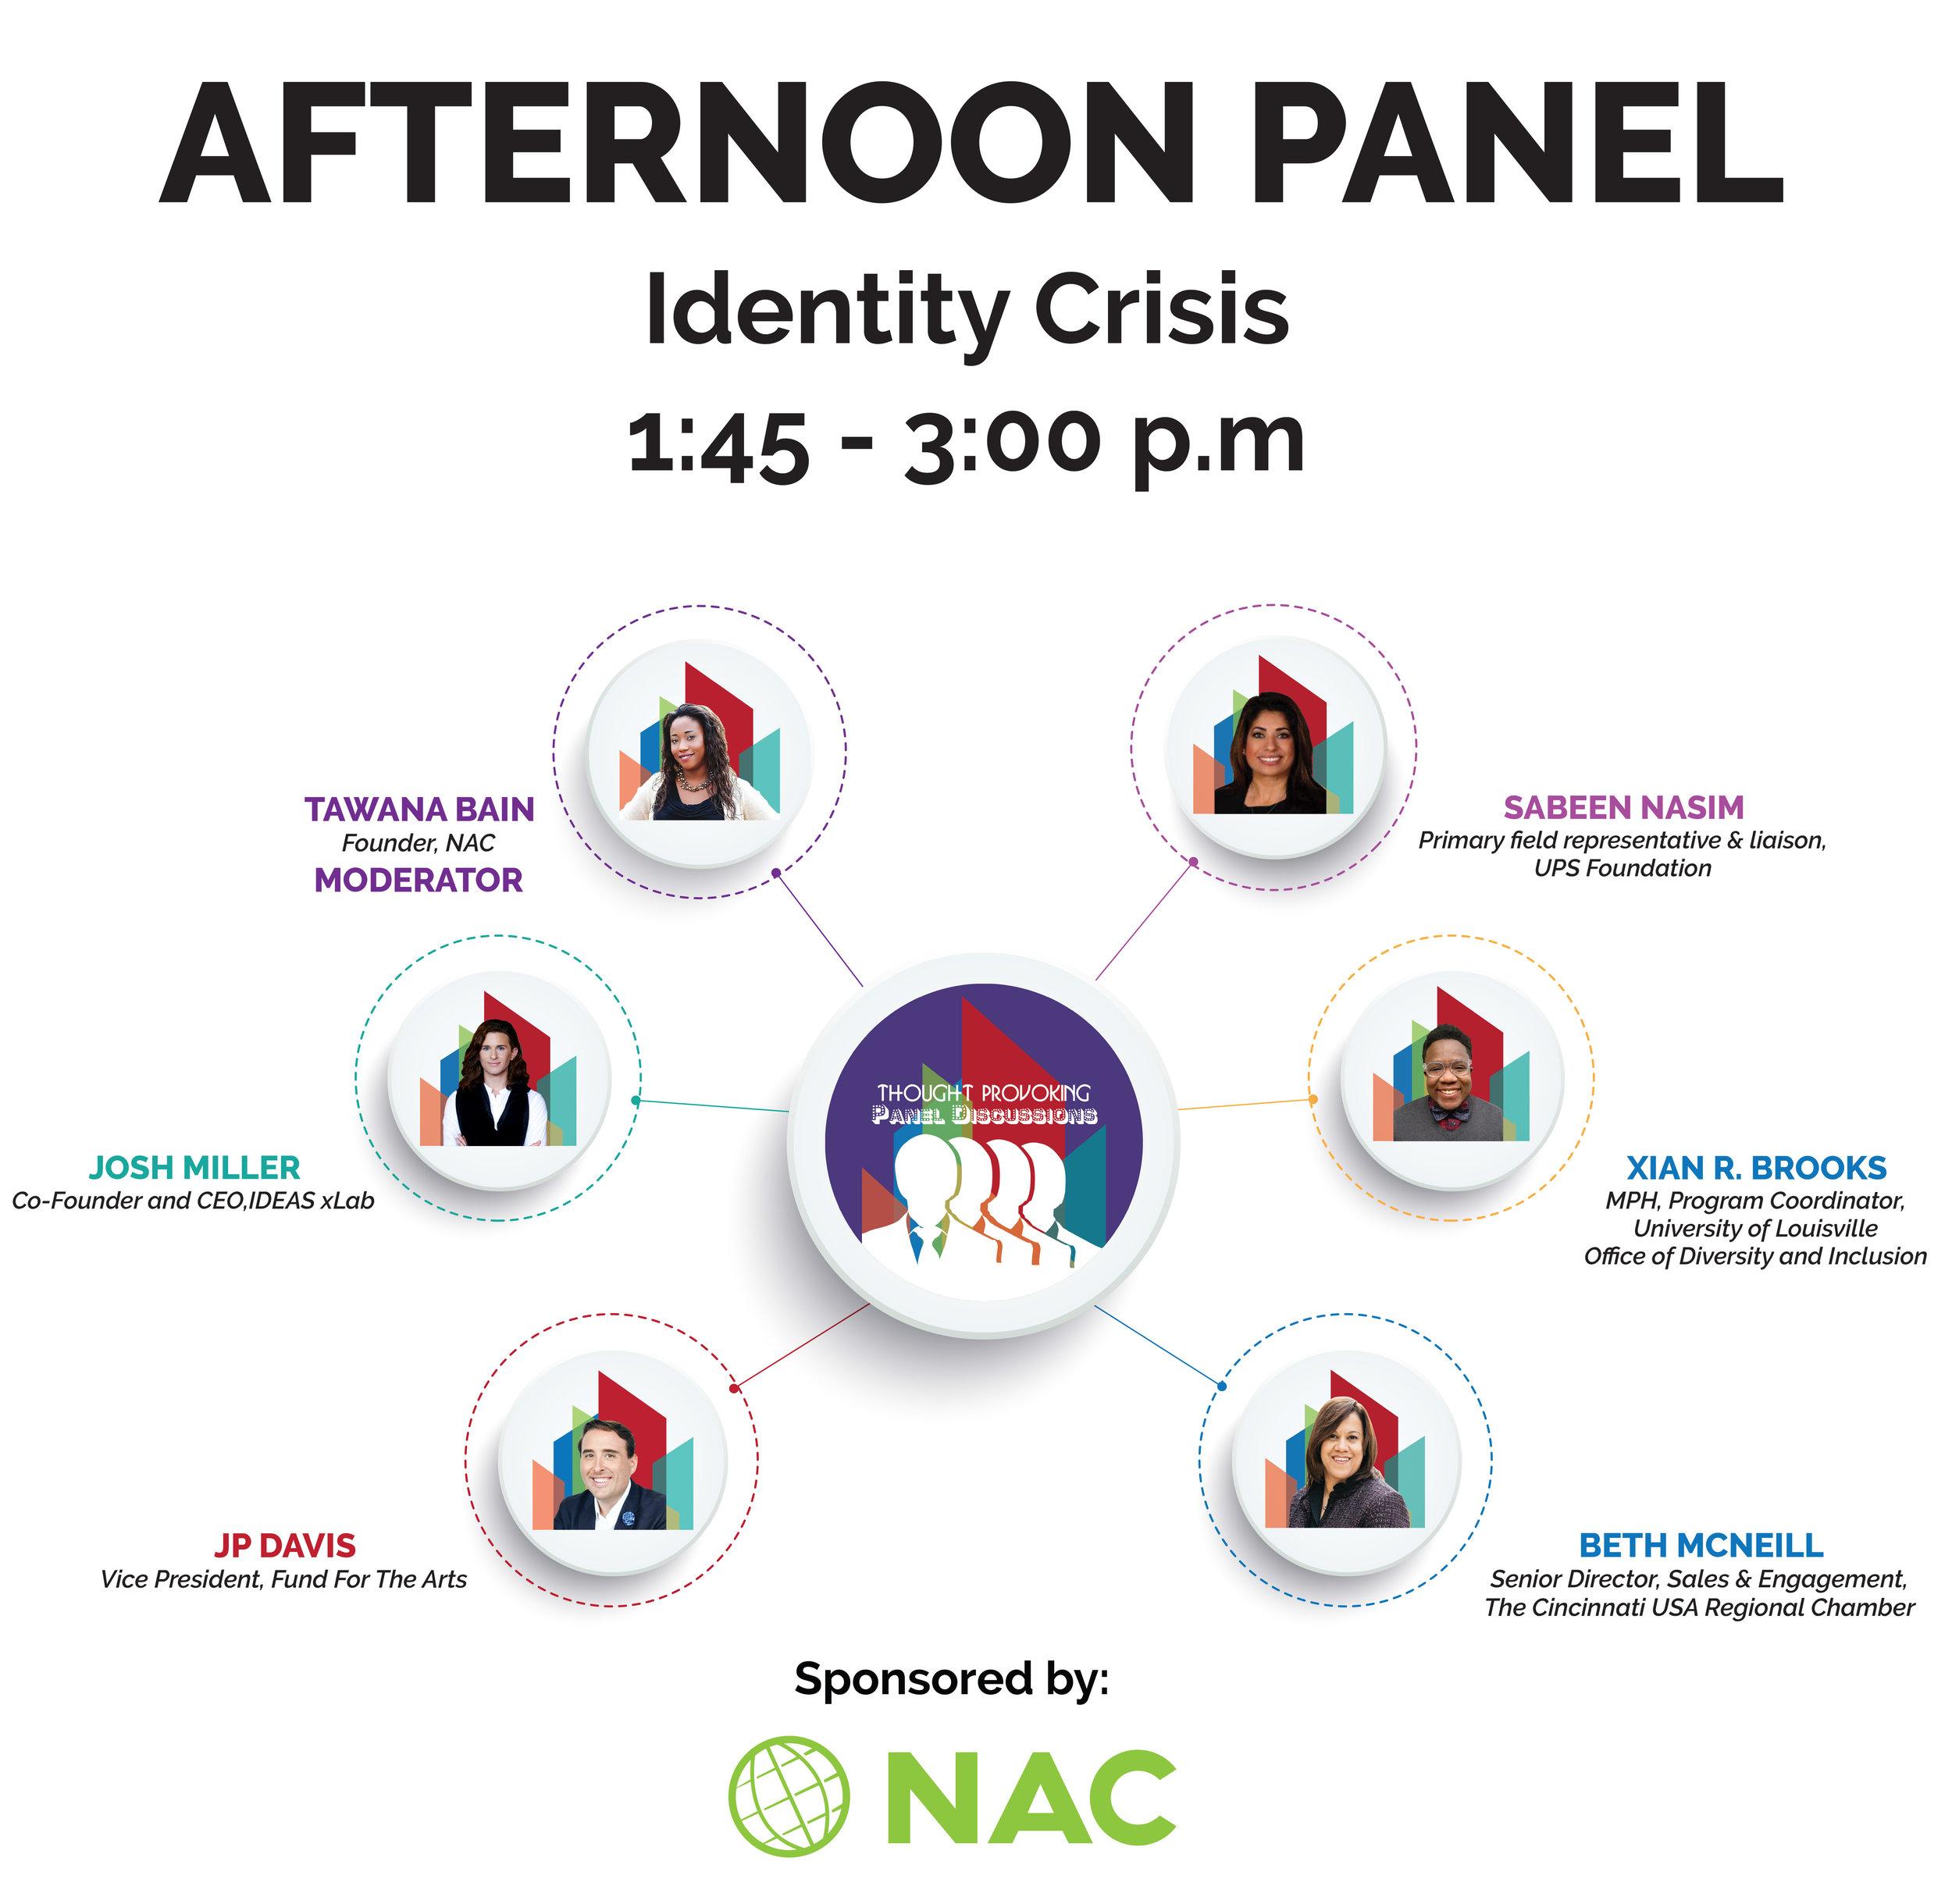 Afternoon-Panel-Identity-Crisis.jpg